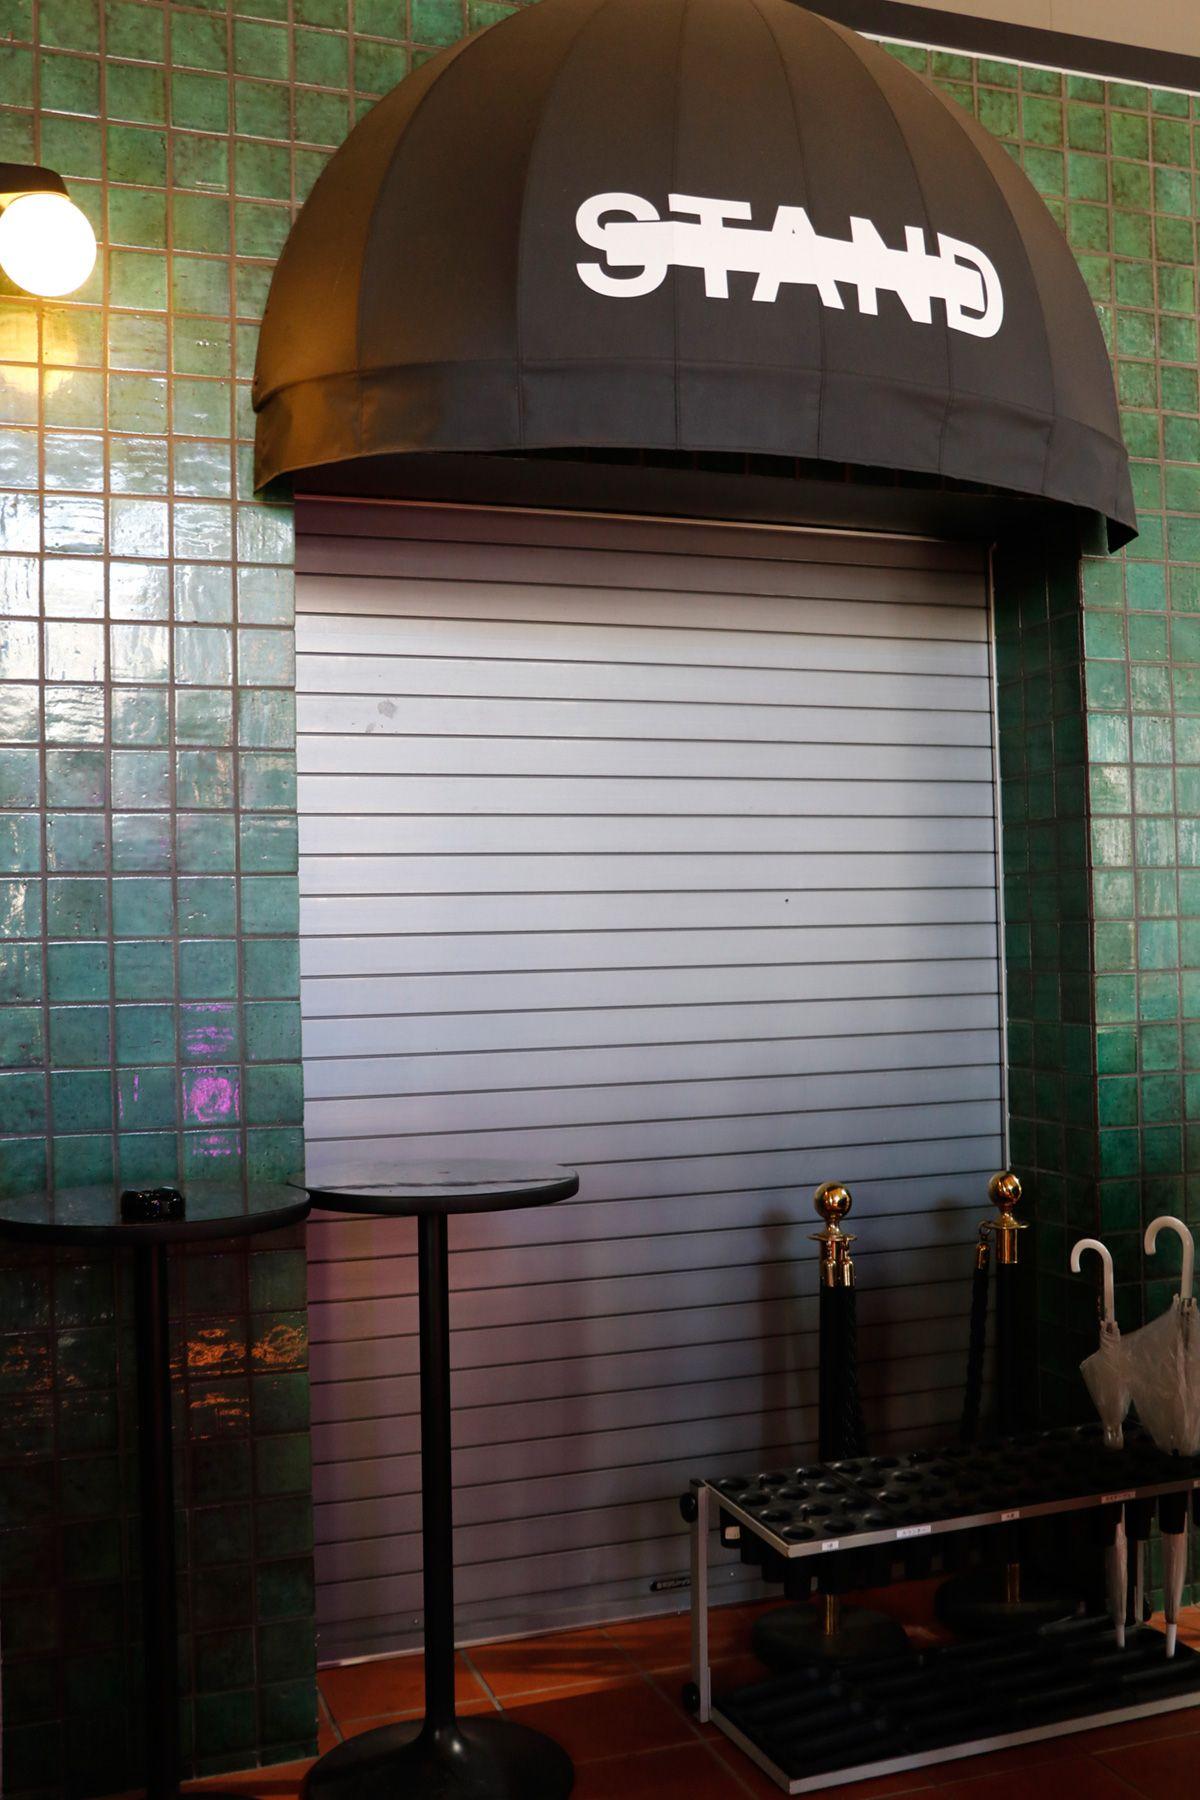 PAVILION(パビリオン)/店舗エントランス横のスタンド